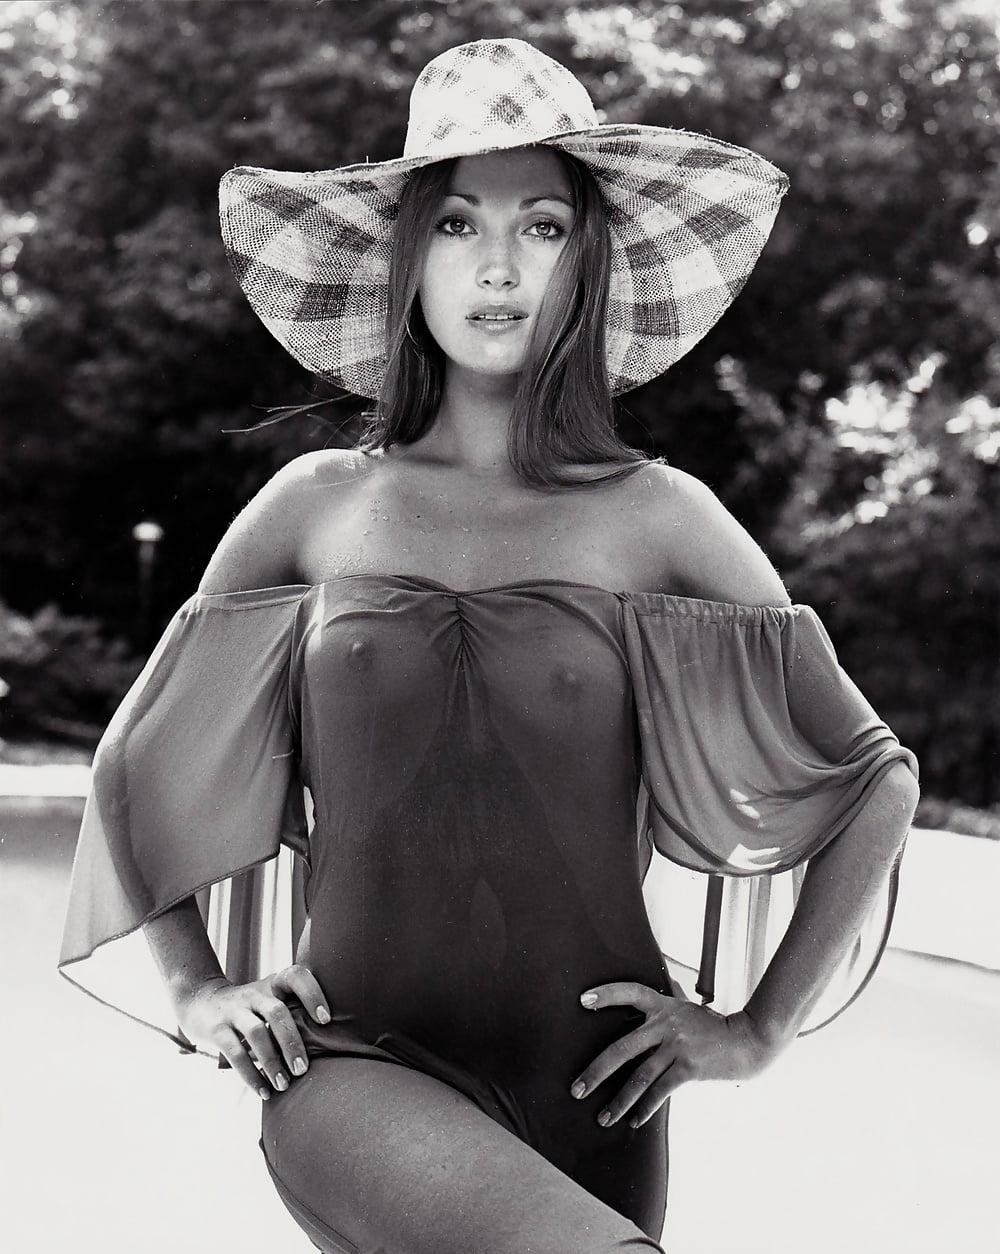 Jane Seymour Playboy